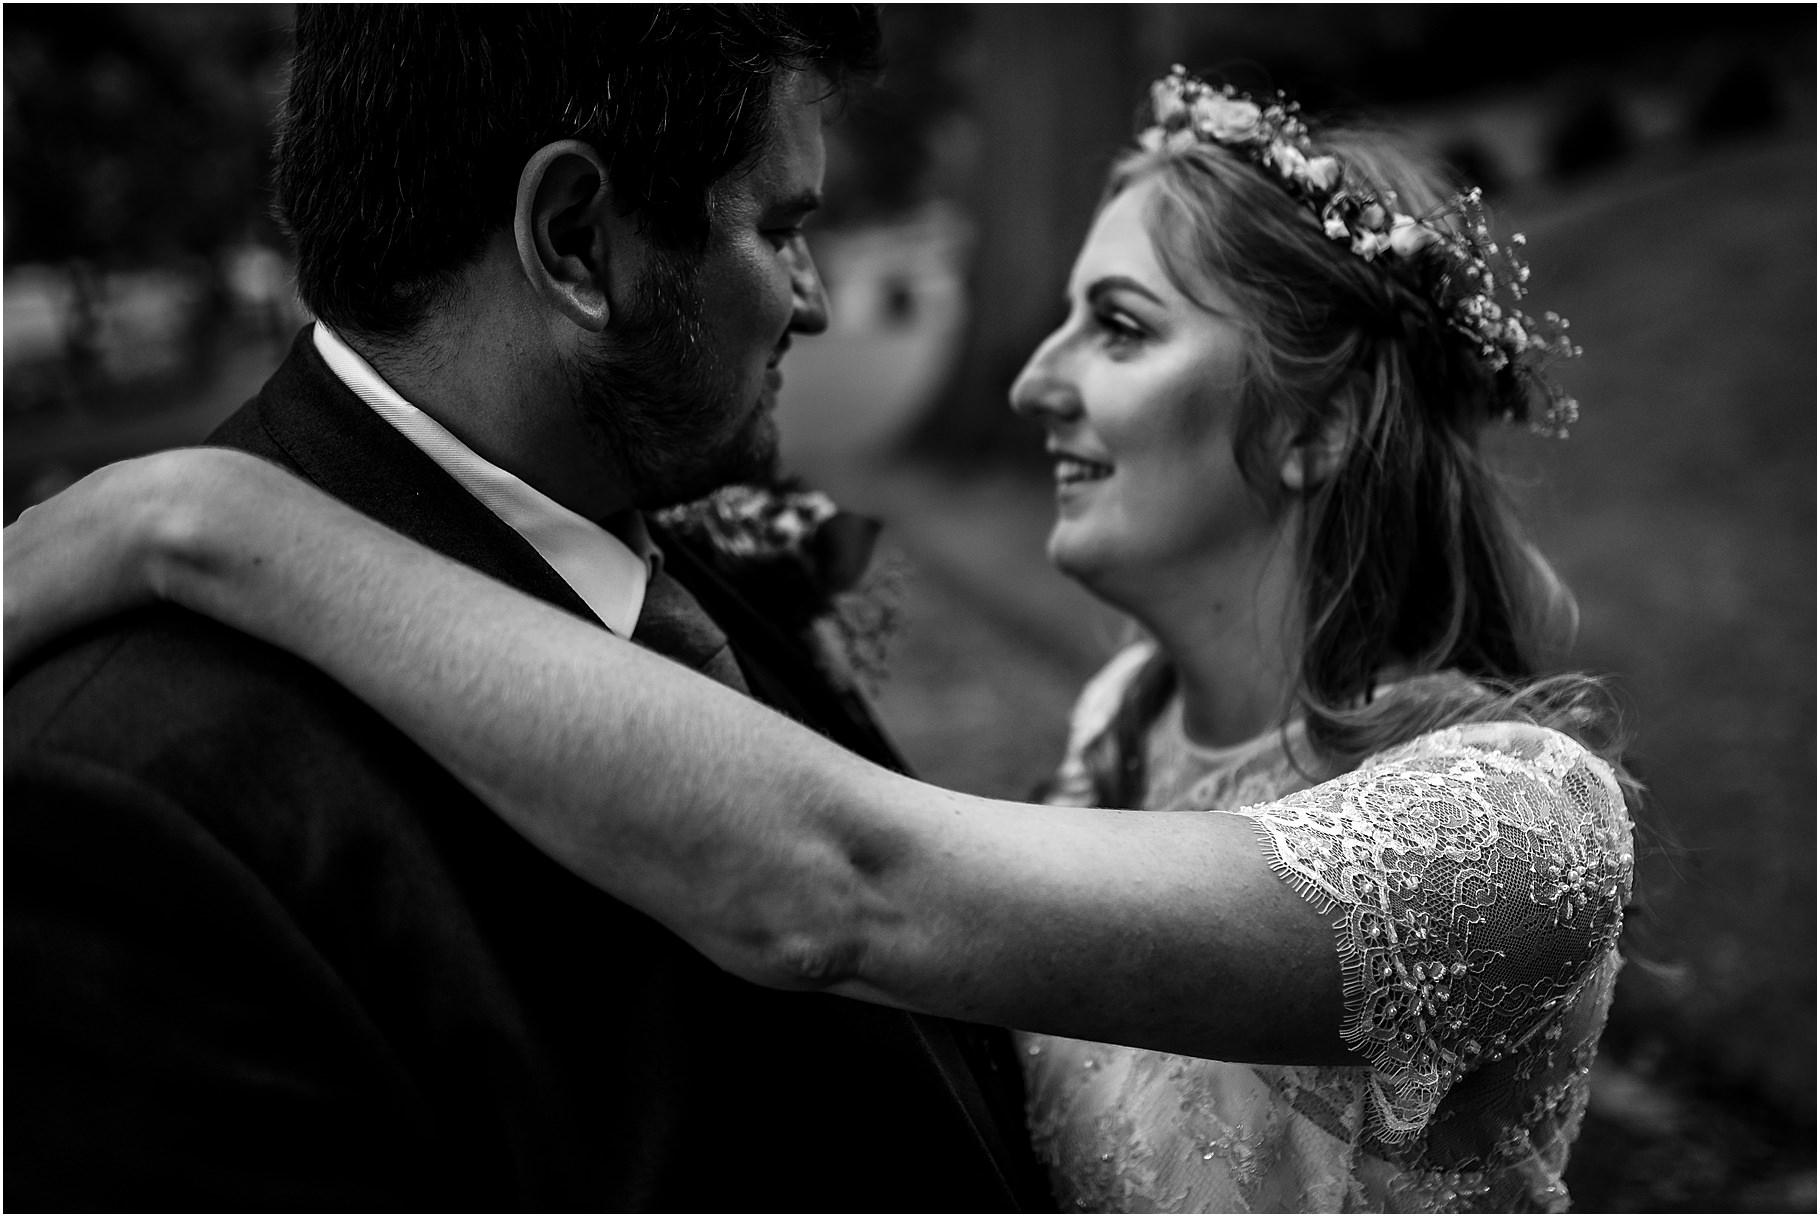 dan-wootton-photography-2017-weddings-103.jpg